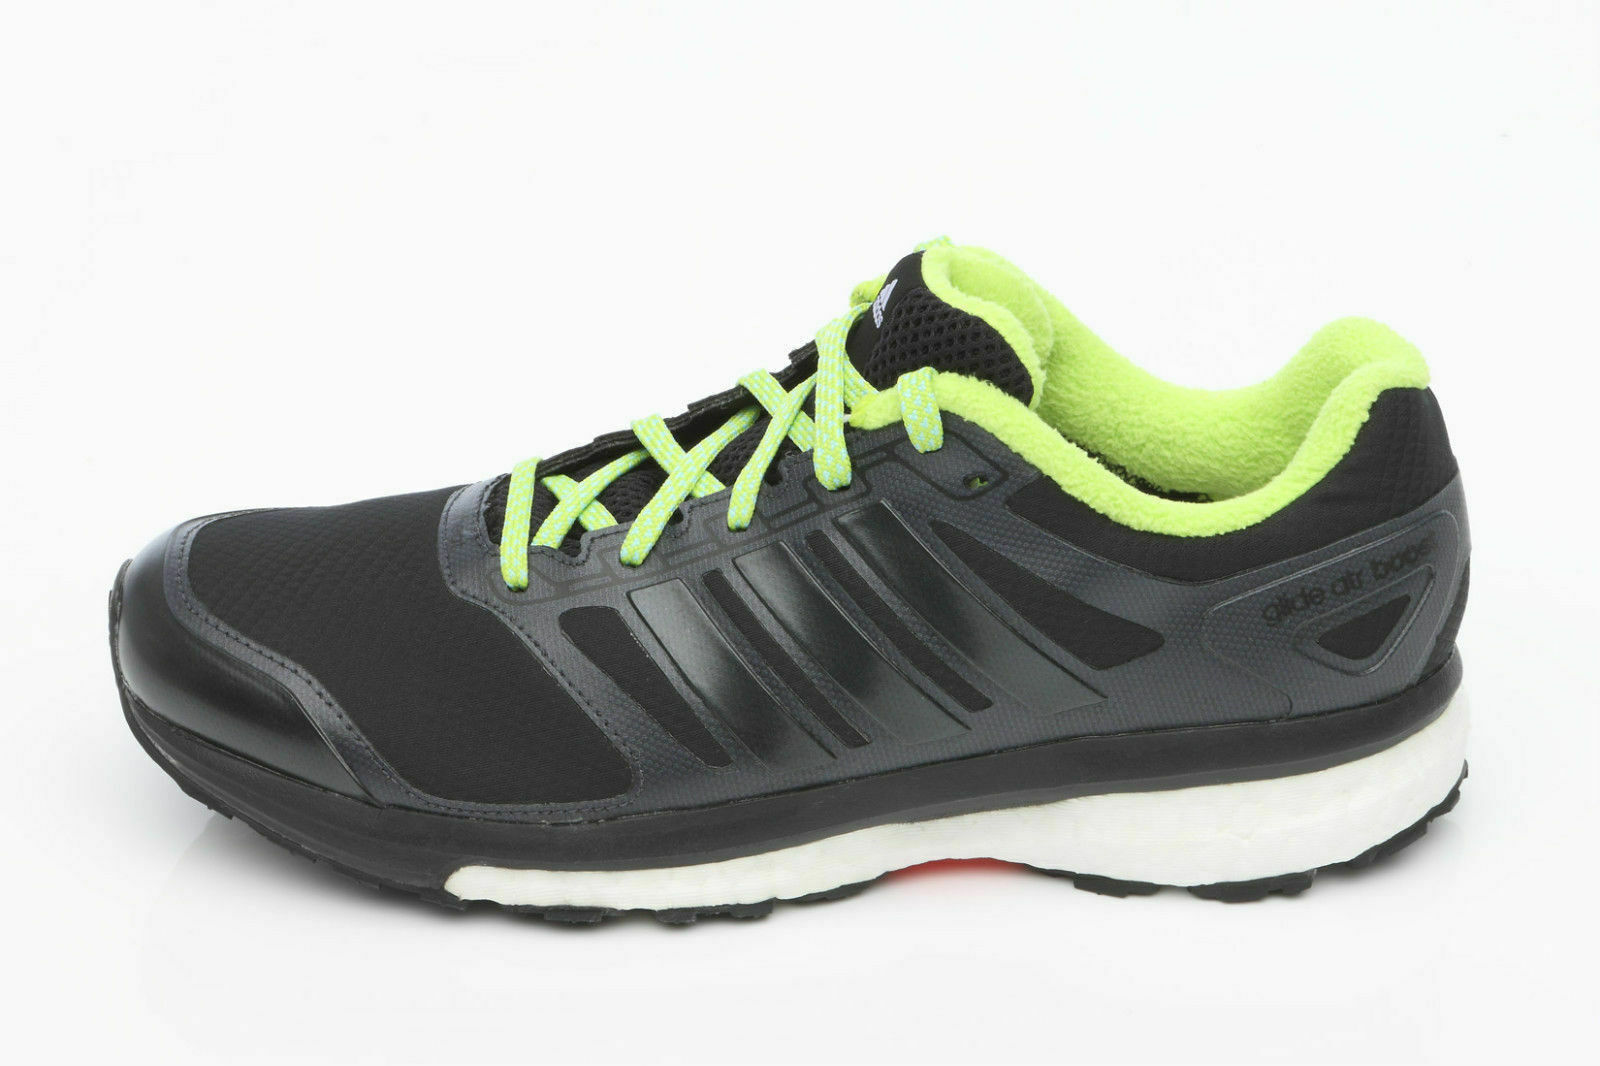 Adidas SUPERNOVA GLIDE ATR BOOST Laufschuhe DaSie Sportchuhe schwarz